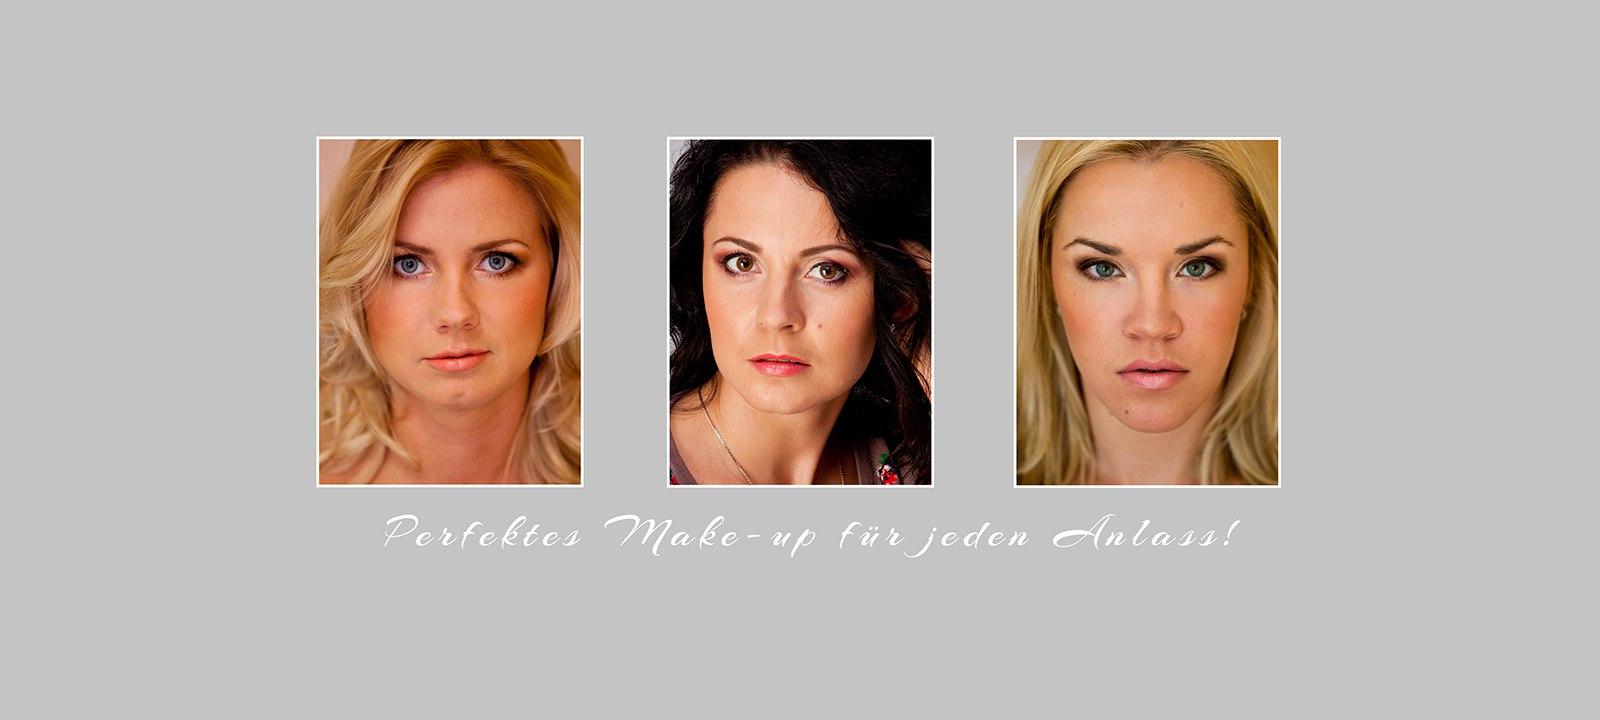 Perfektes_Makeup_Anlass_Fotostudio_web